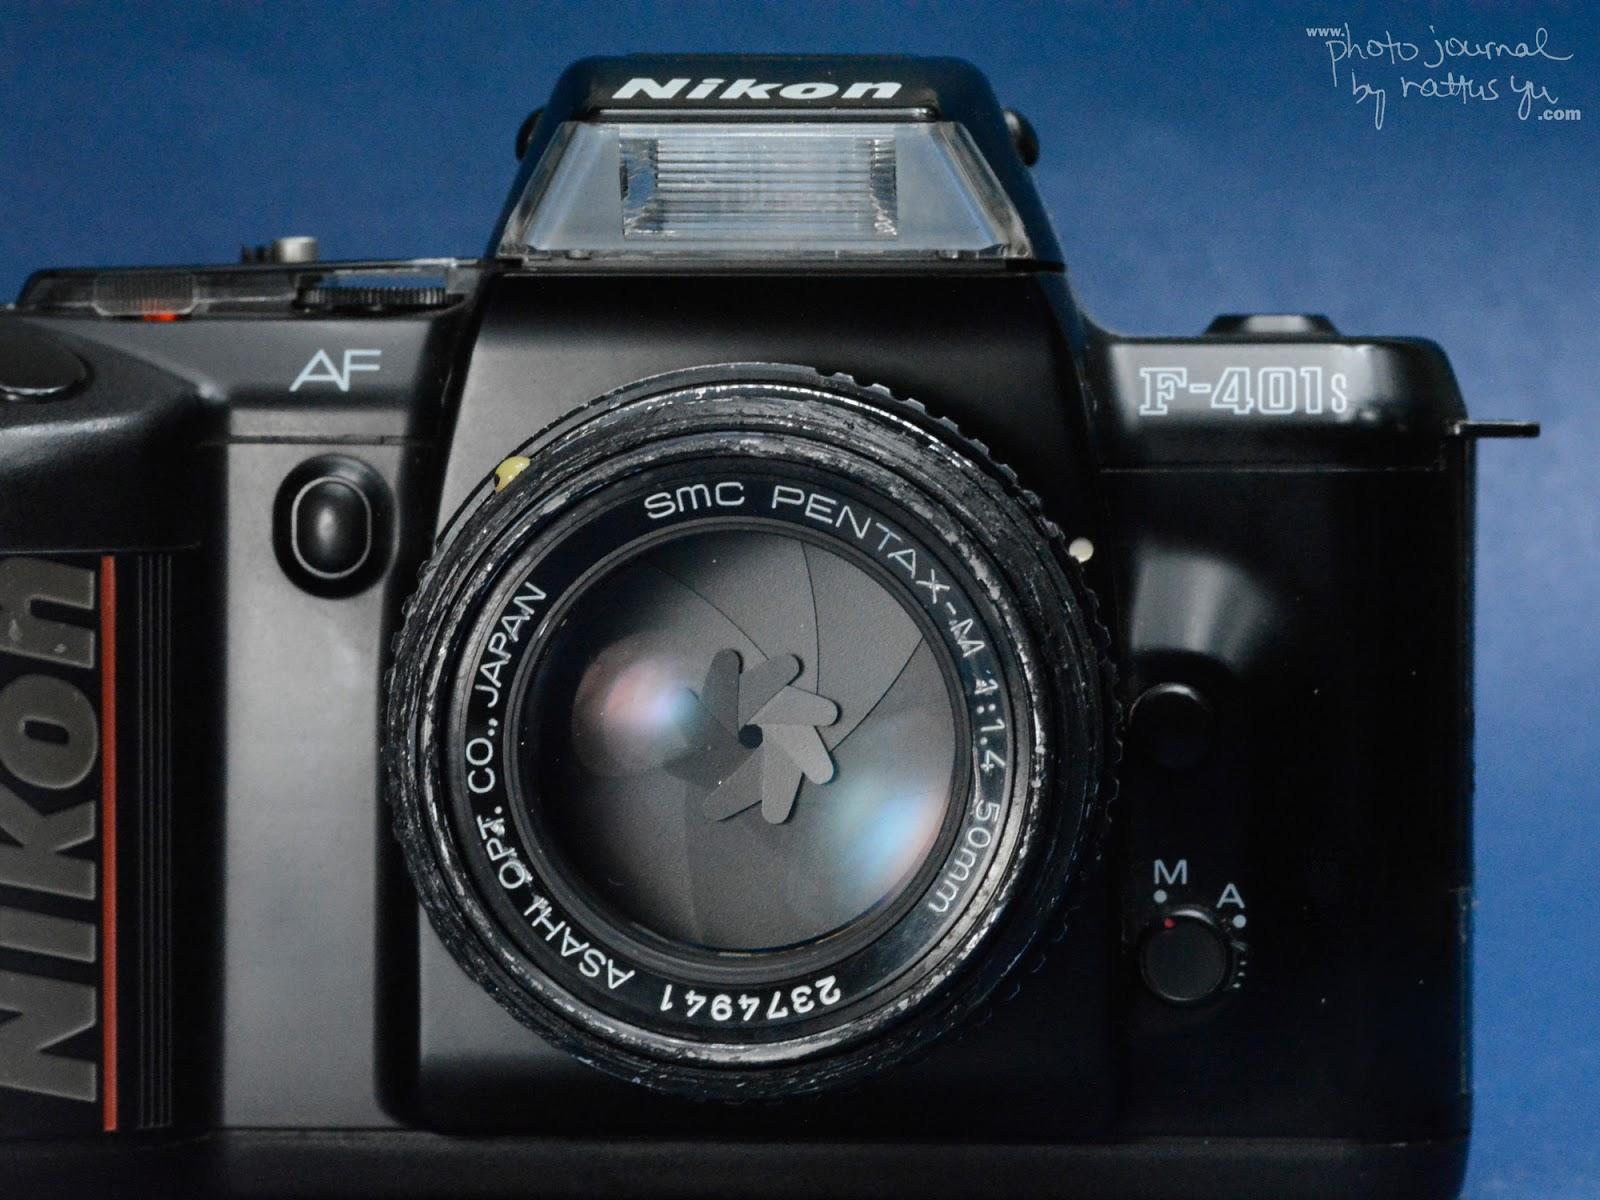 SMC Pentax-M 50mm f/1.4